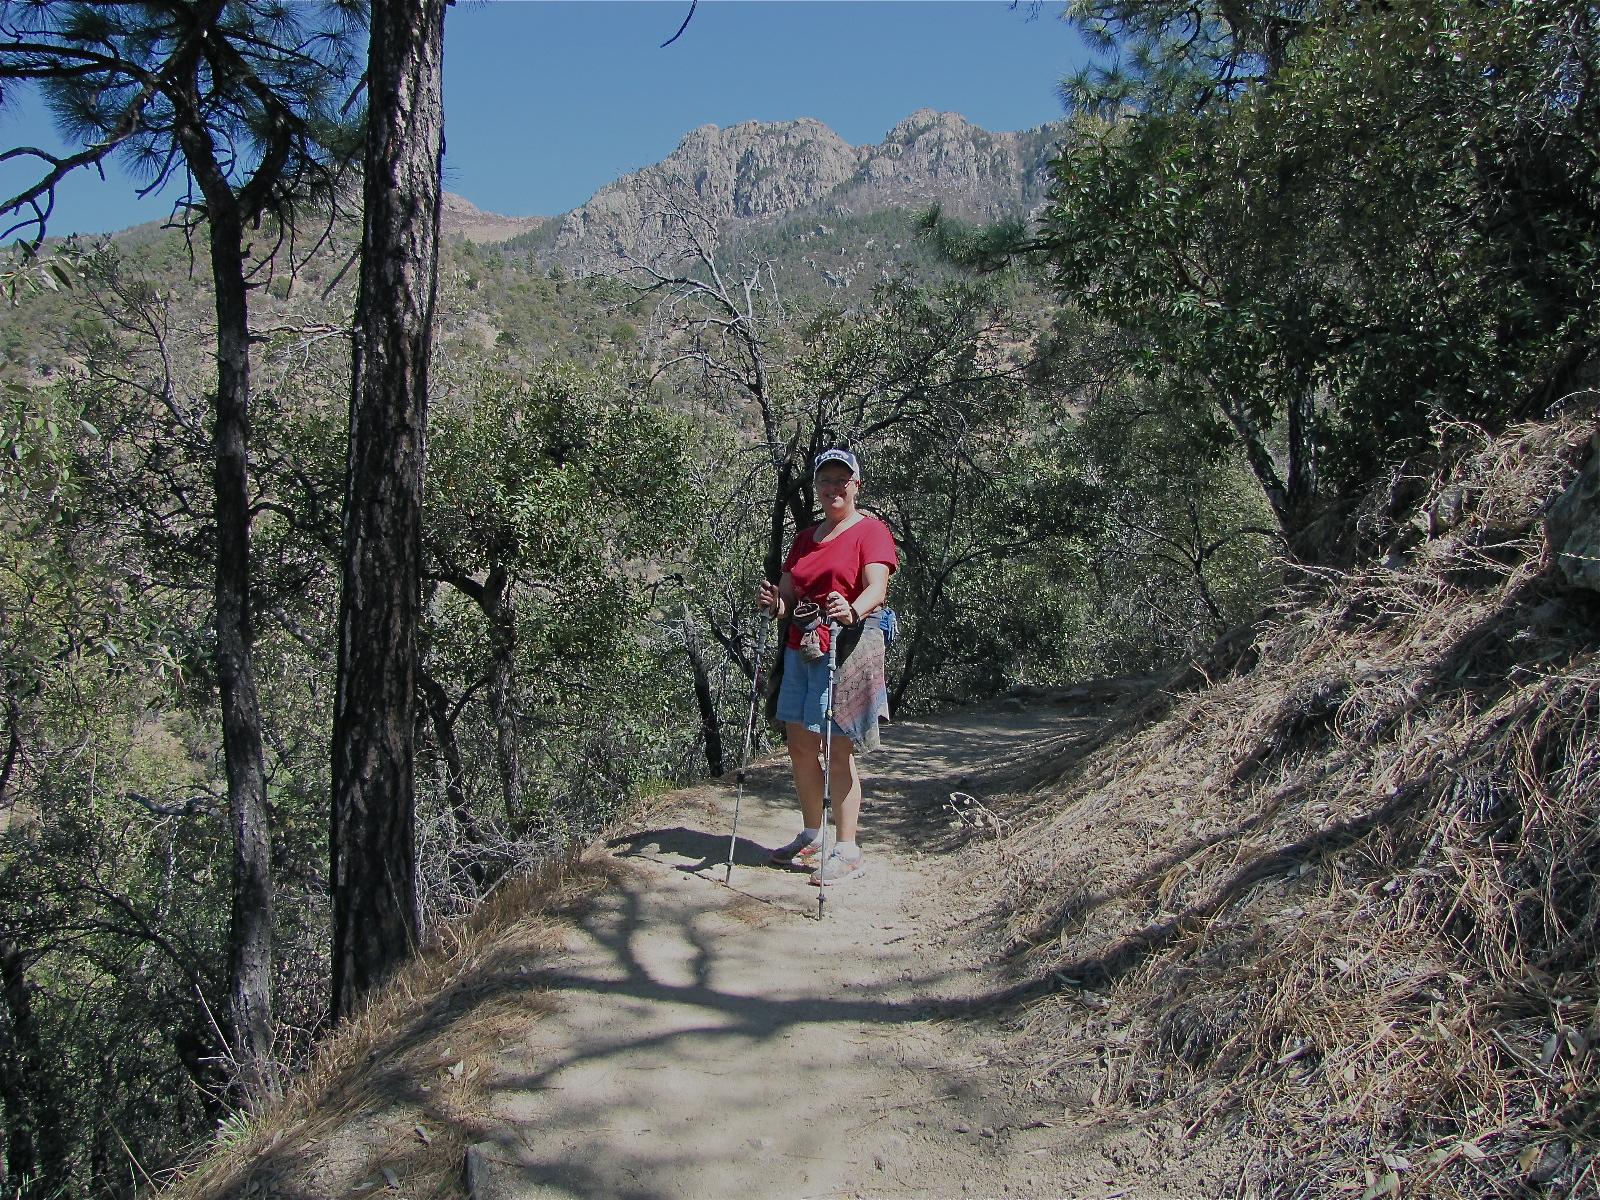 There Are Exceptional And Varied Hiking Trails At The Canyon...also Three  Places Of Lodging  The Santa Rita Lodge, Madera Kubo B U0026 B, And Chuparosa  Inn. ...